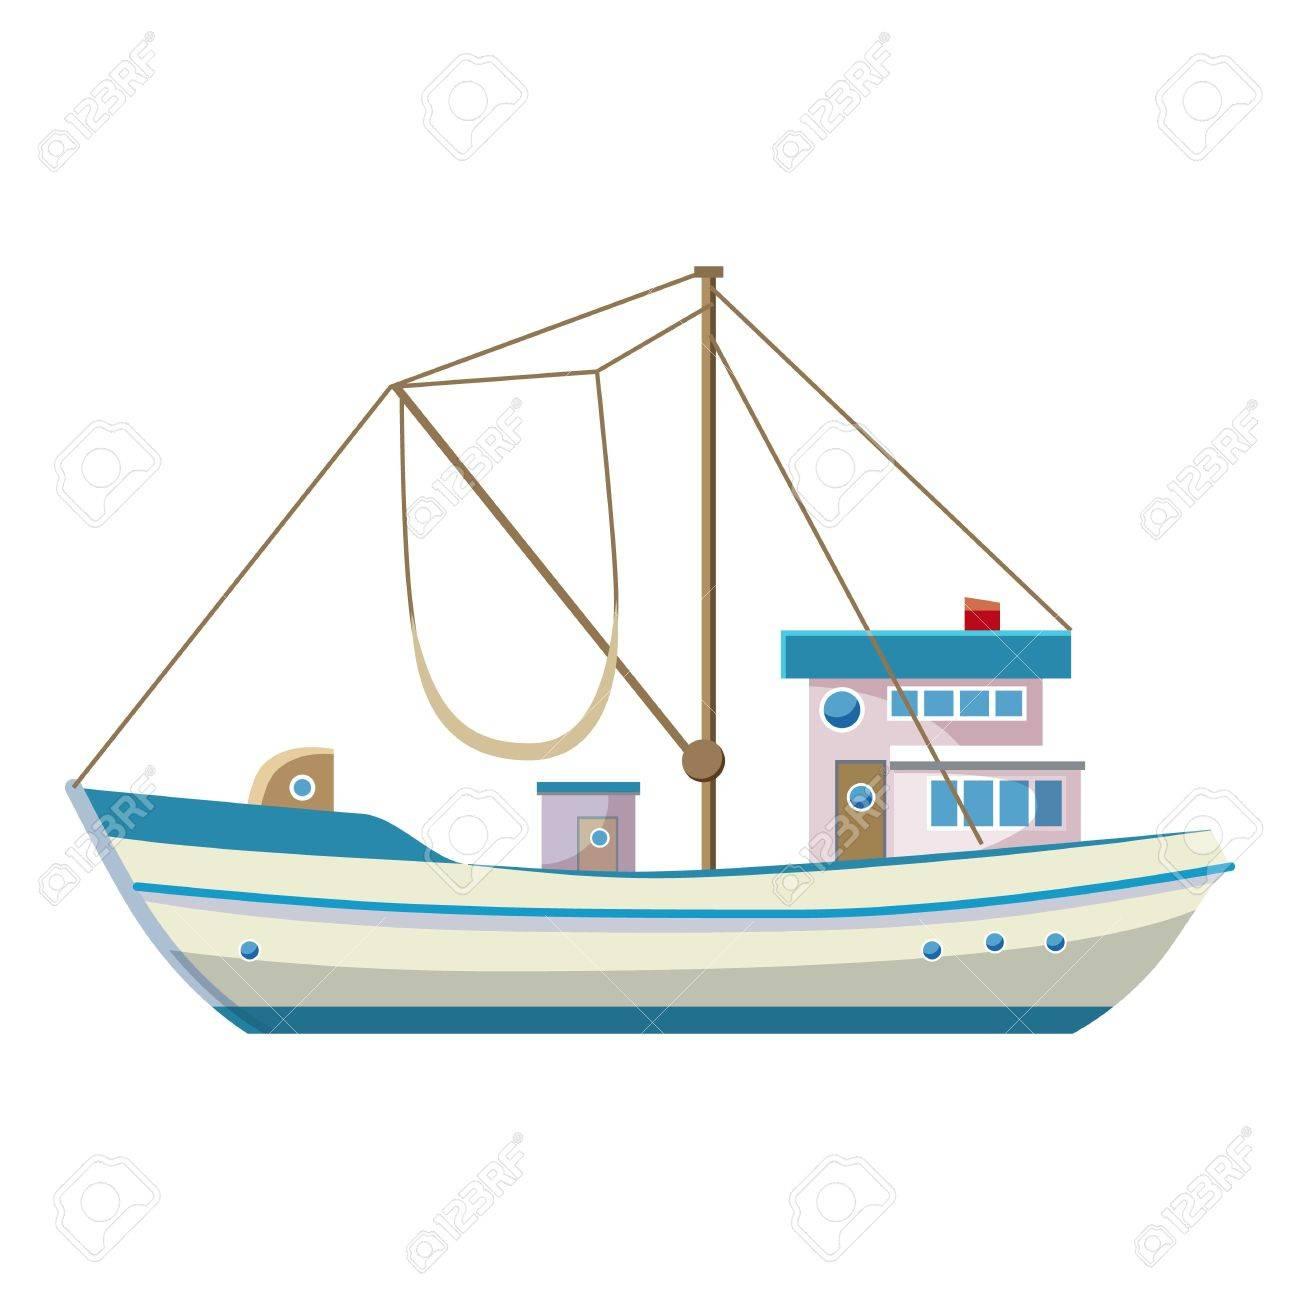 Fishing Boat Icon Cartoon Illustration Of Fishing Boat Vector Royalty Free Cliparts Vectors And Stock Illustration Image 69756805